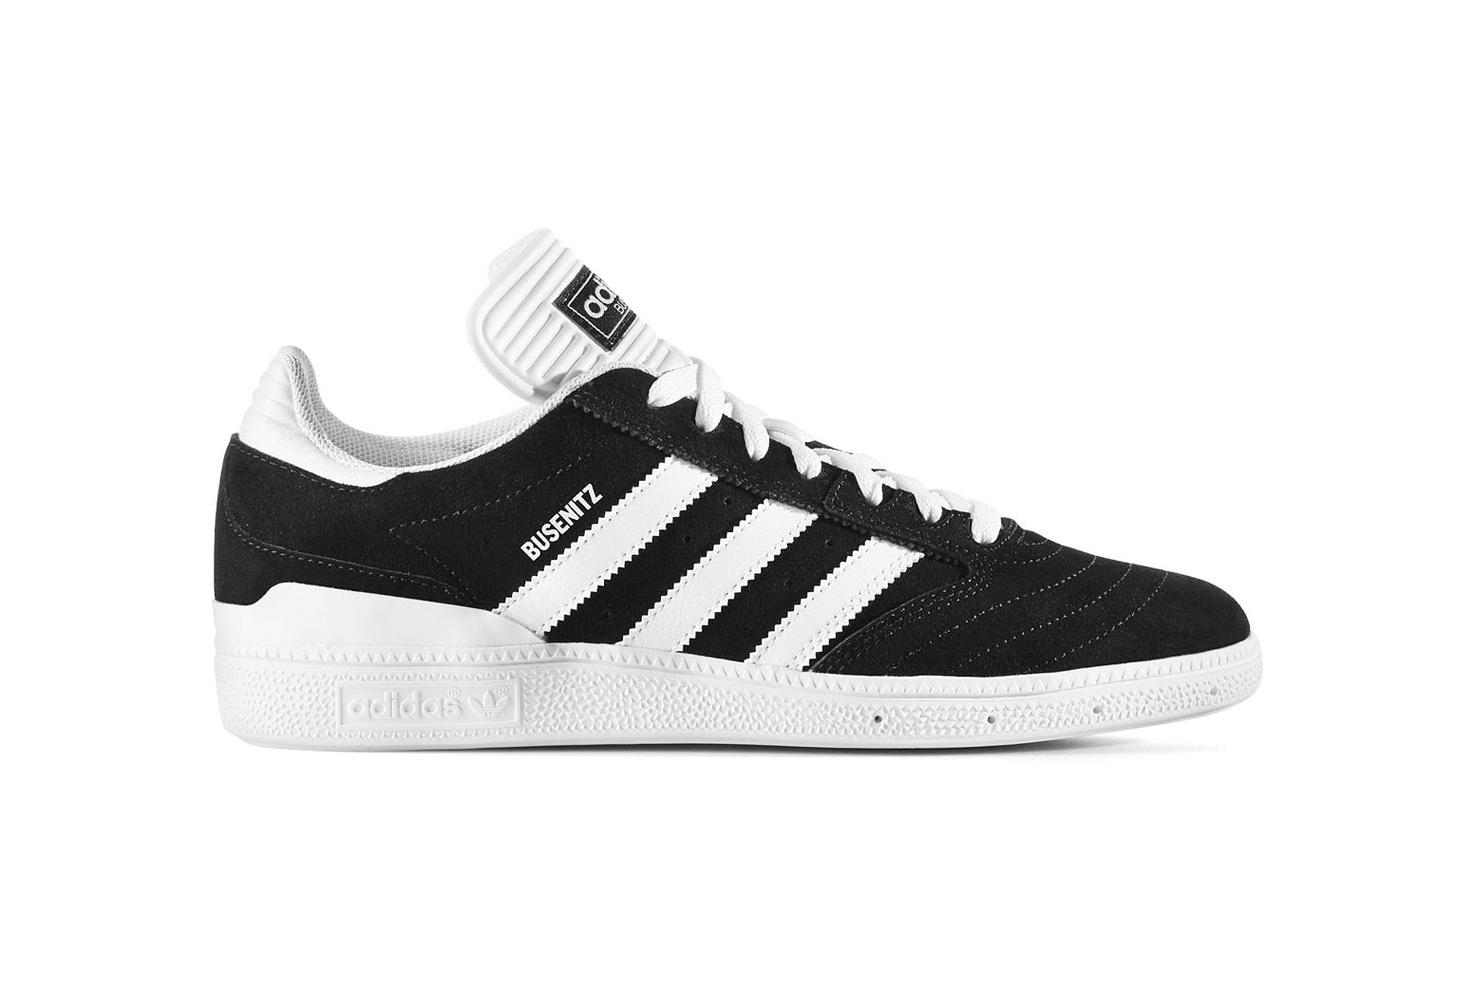 adidas-busenitz-gazelle-pack-3.jpg